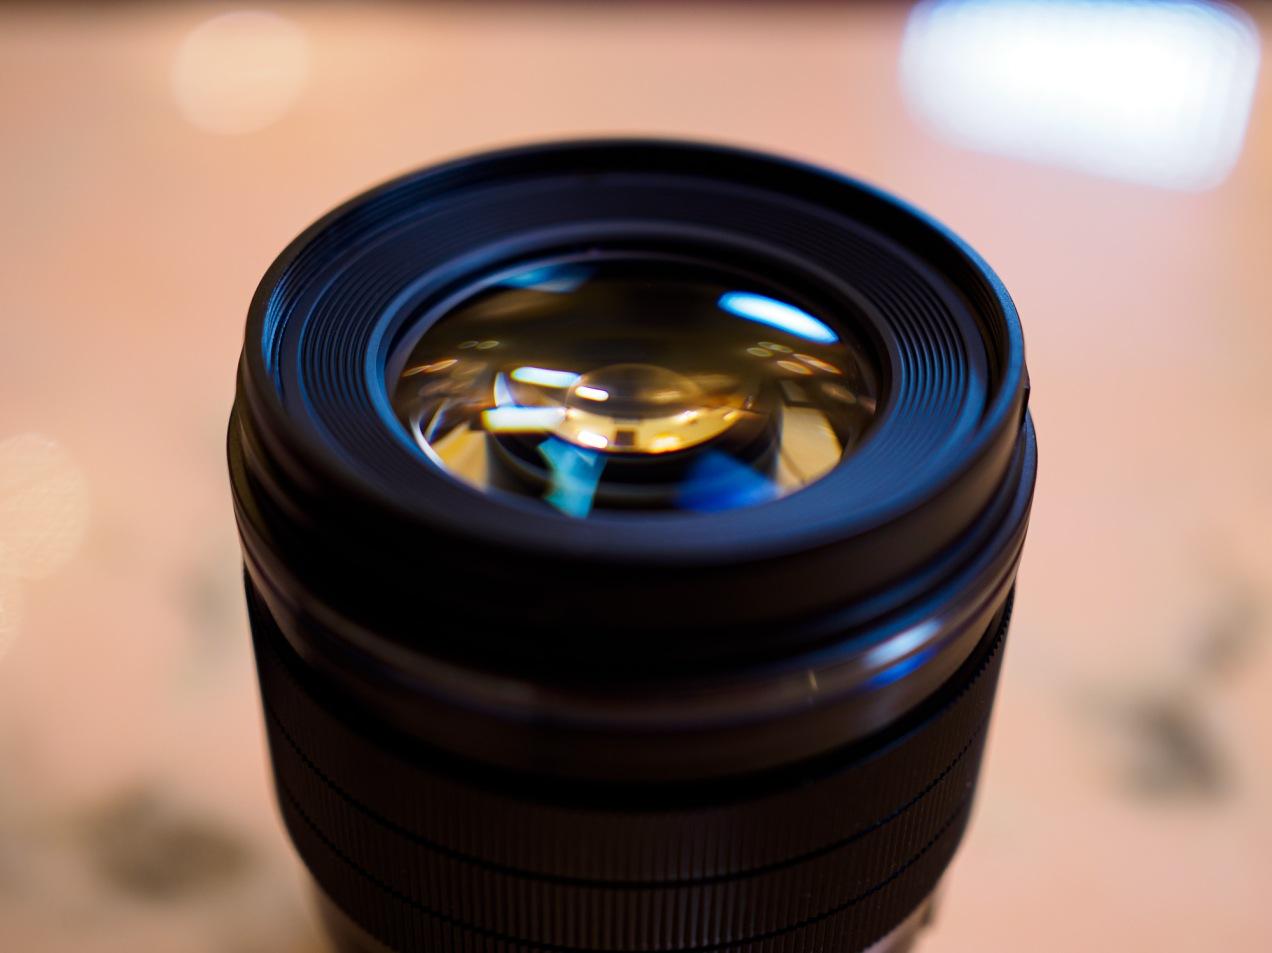 Olympus 25mm f1.2 PRO lens